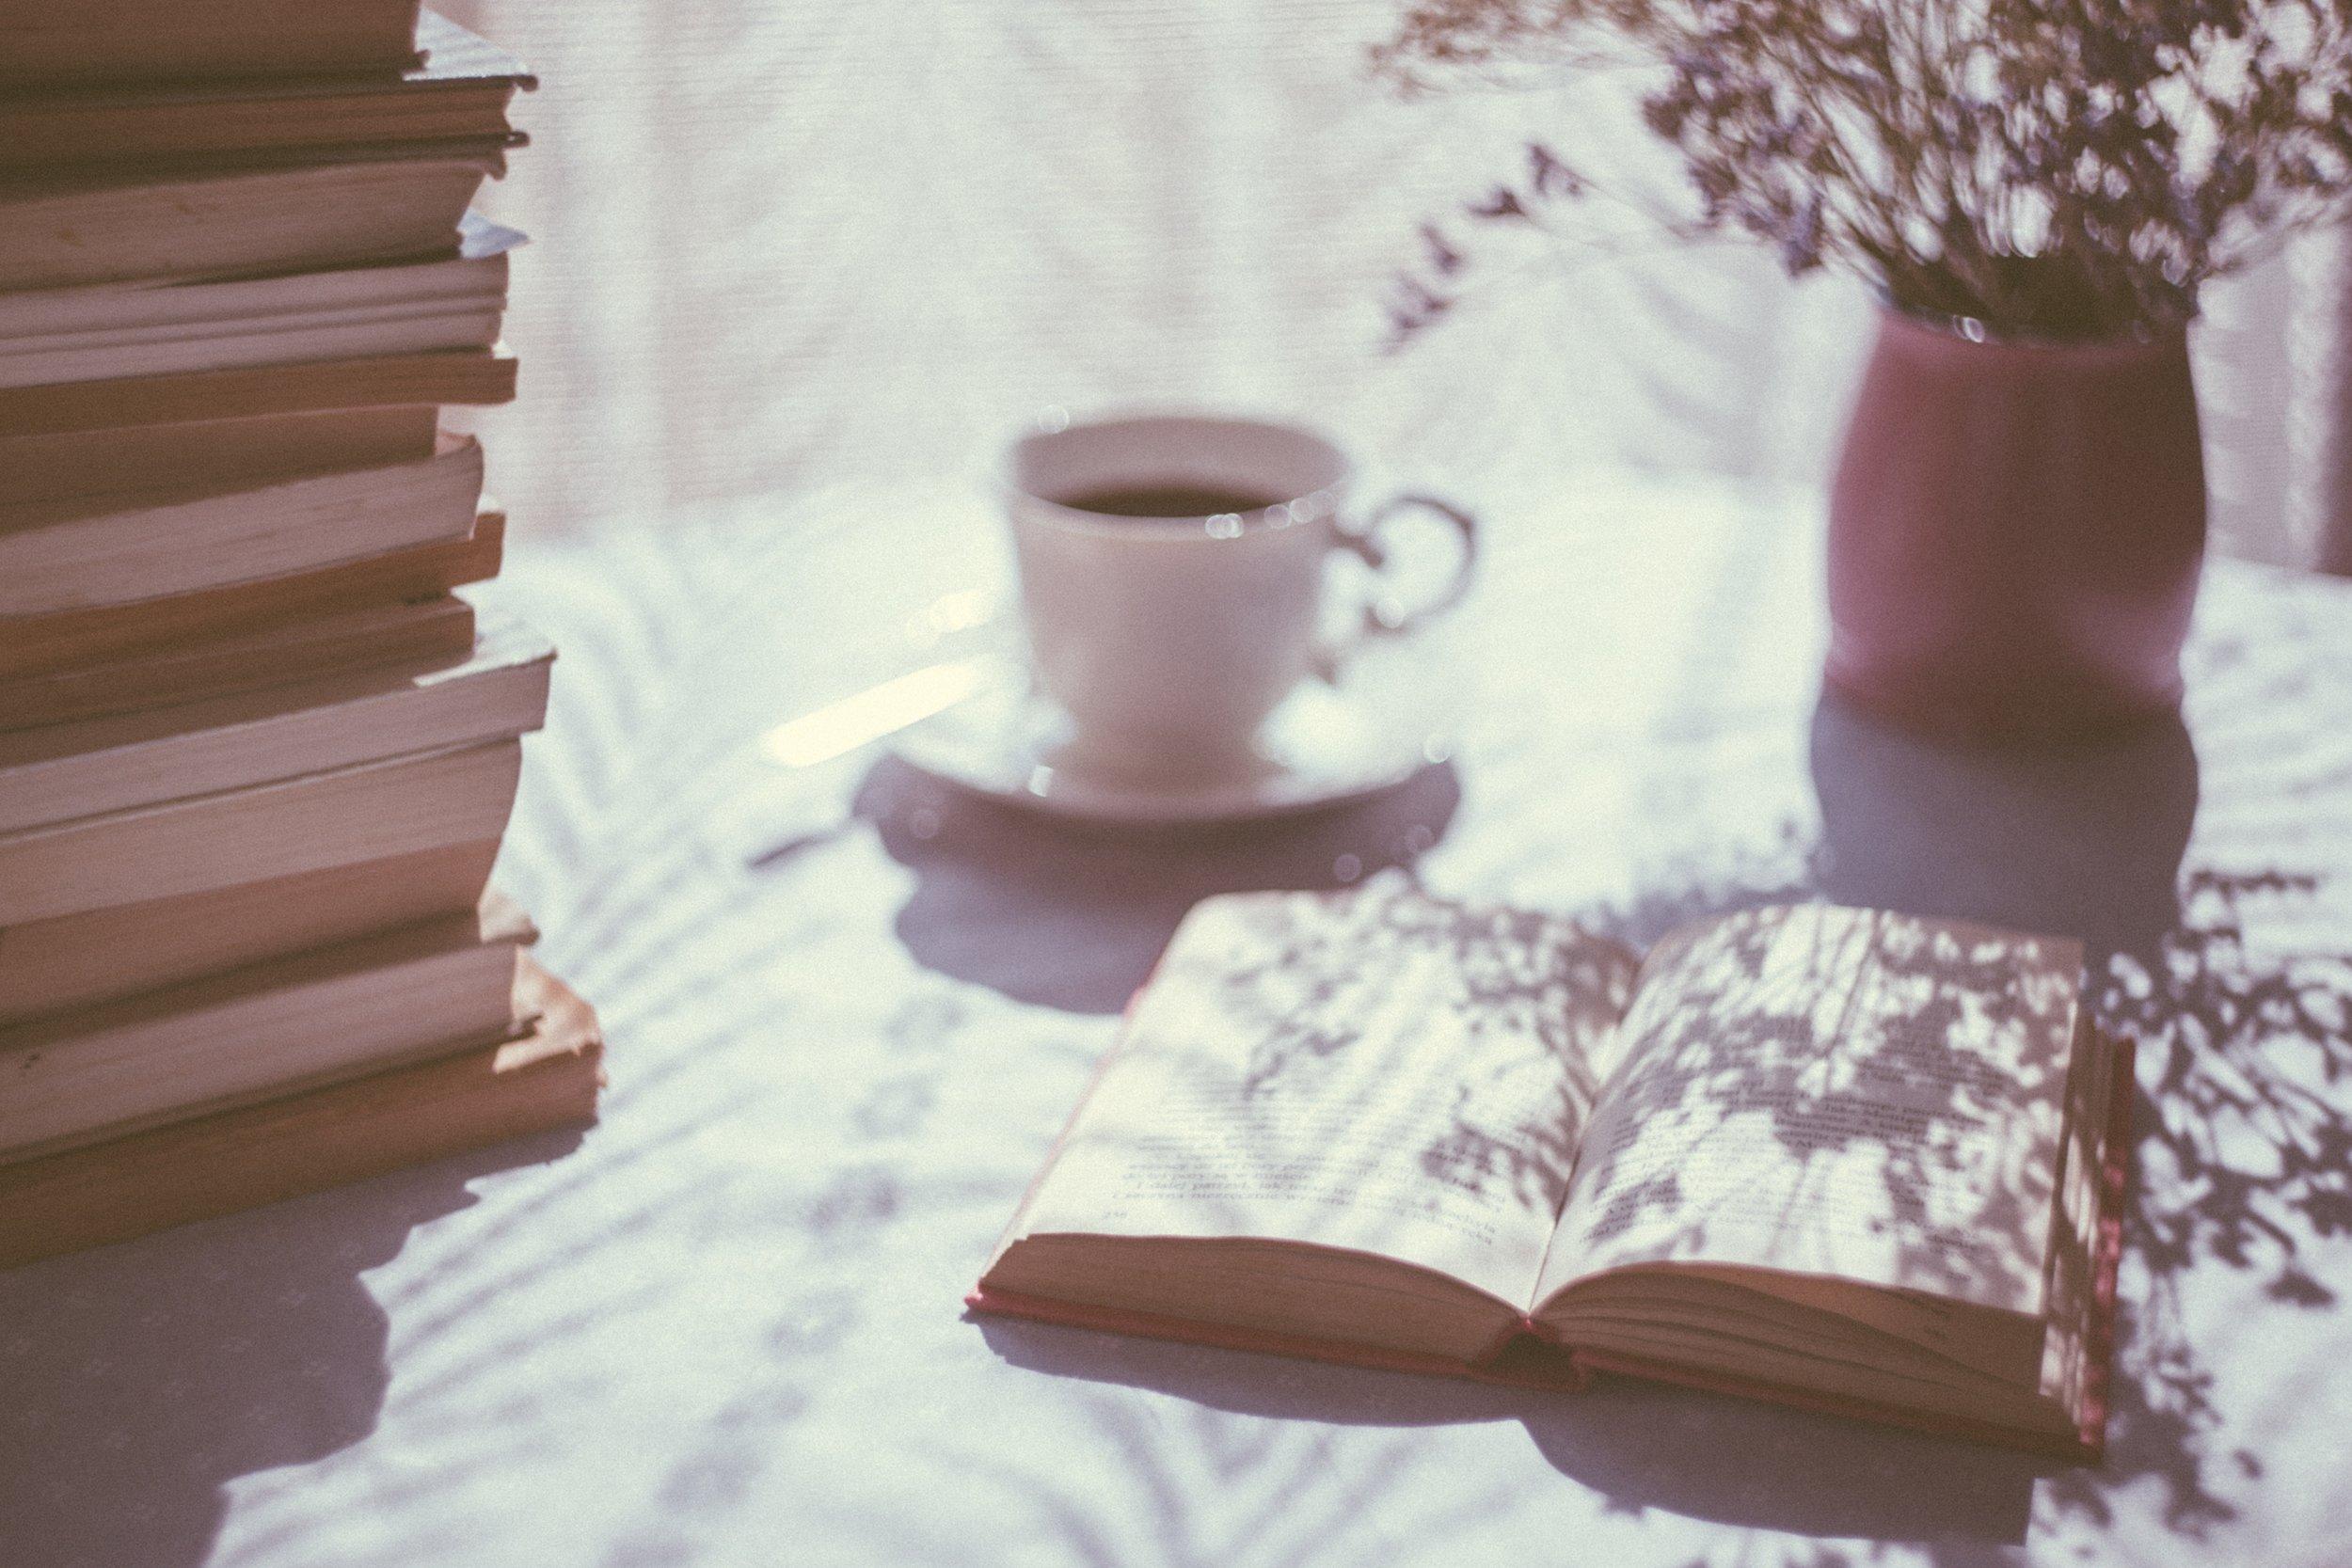 blur-book-books-176103.jpg